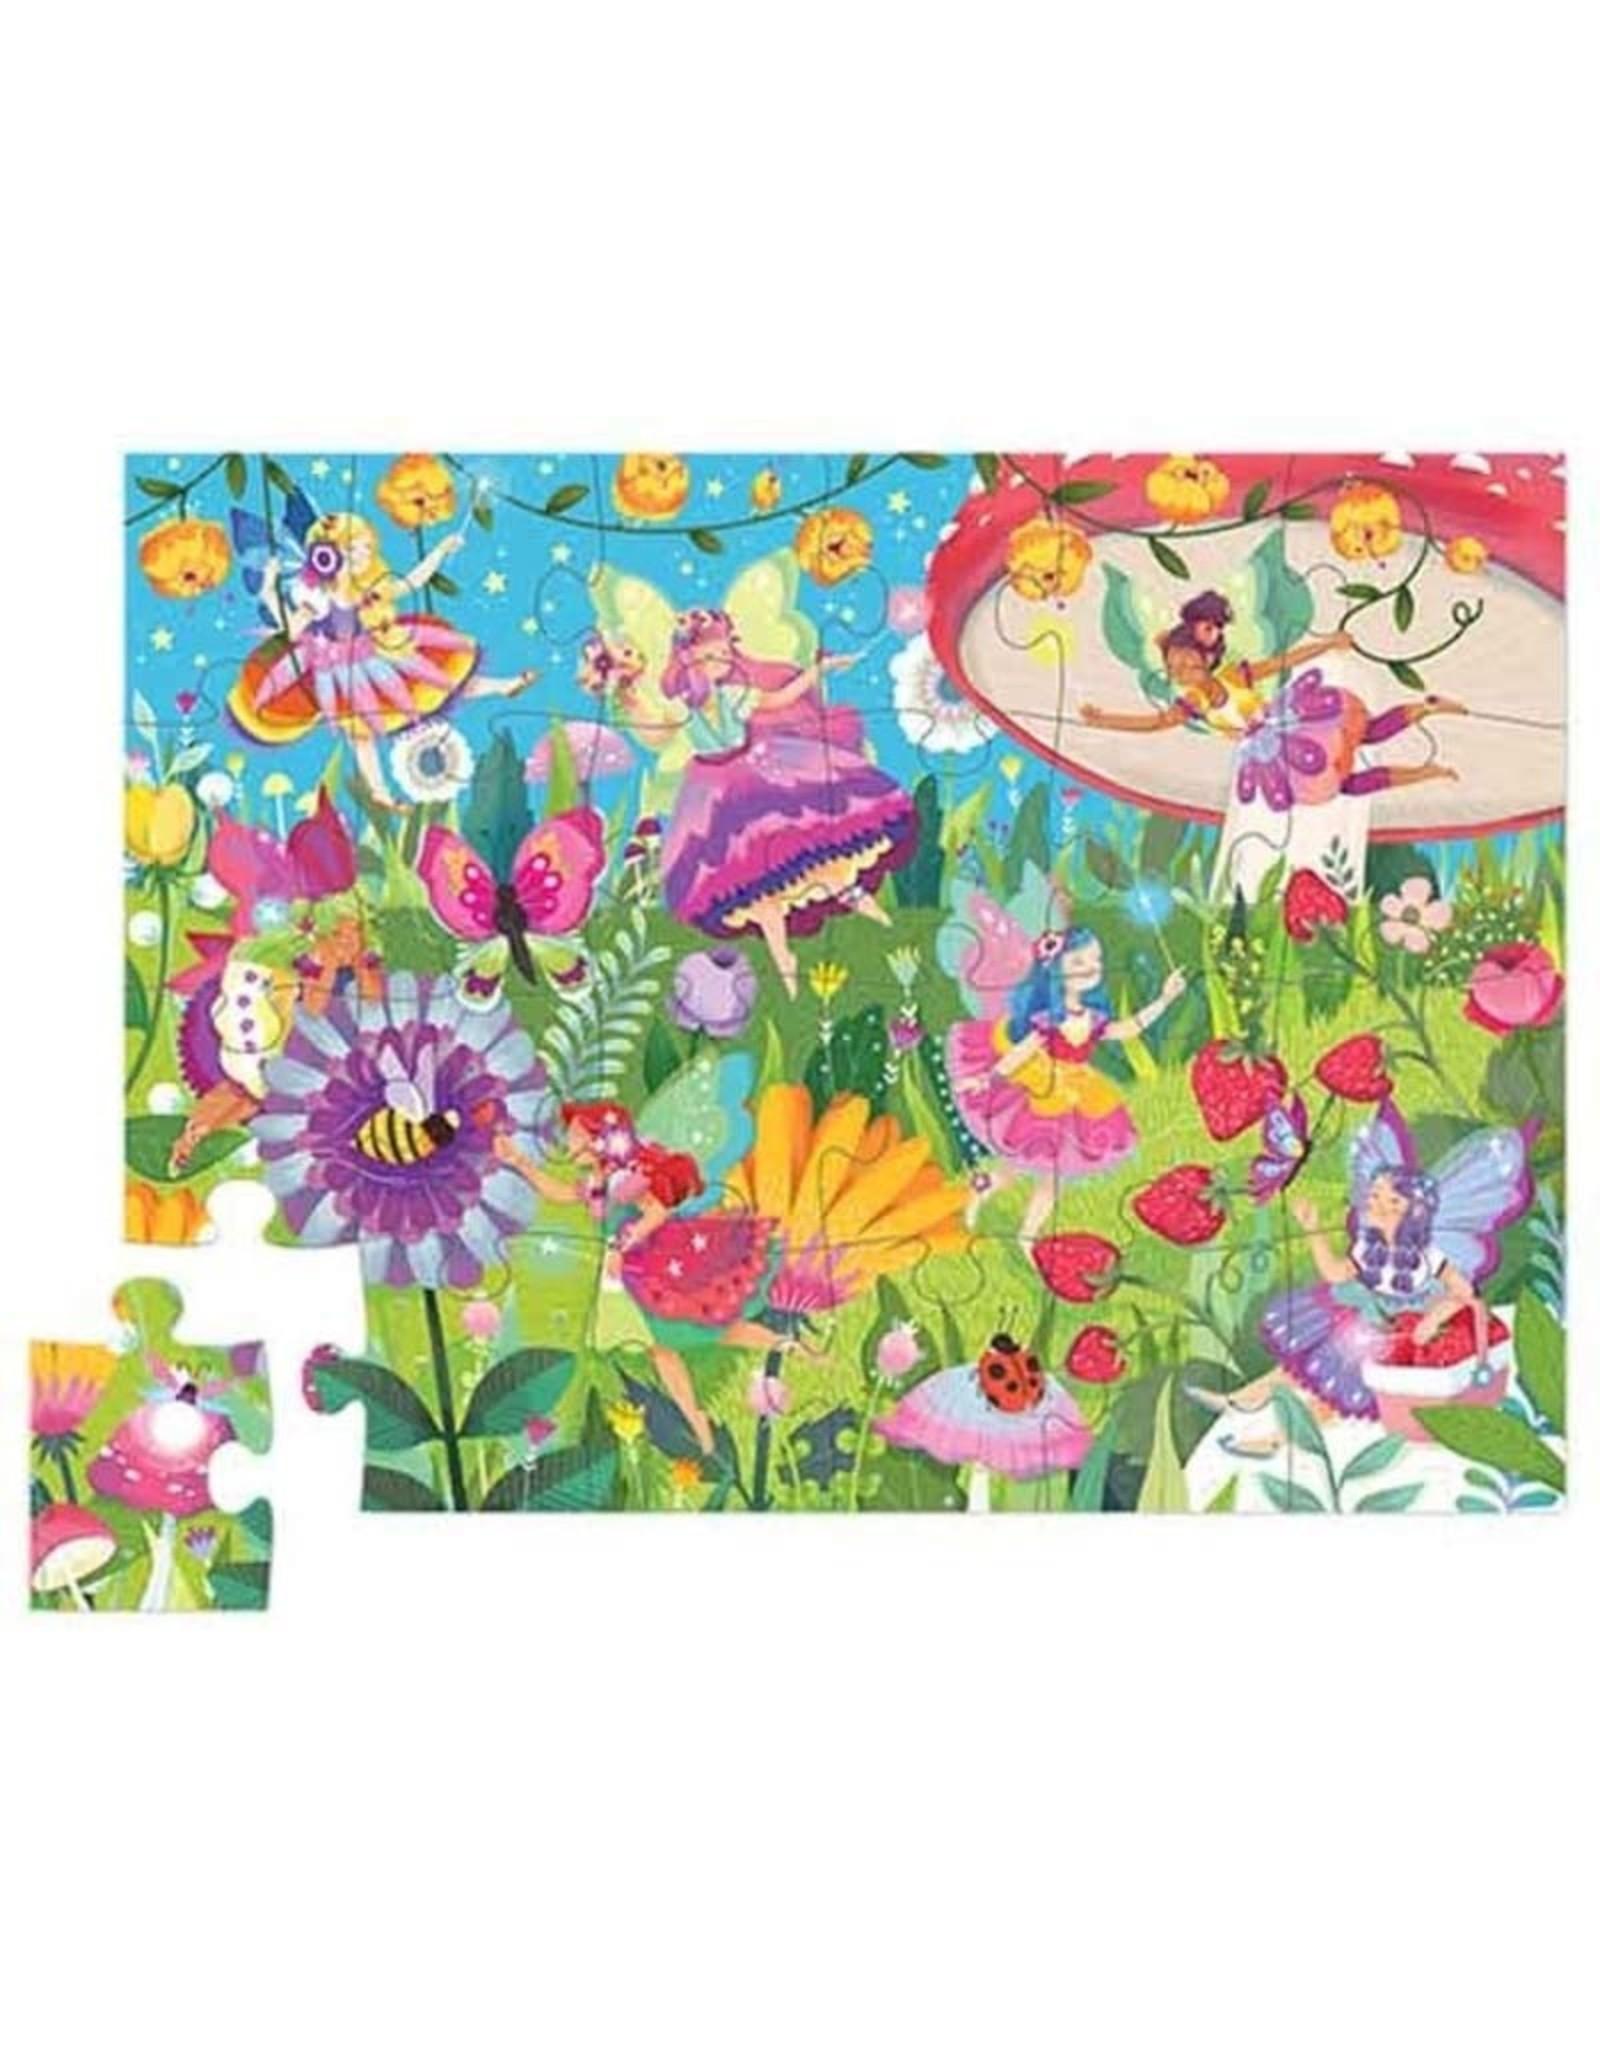 24pc Puzzle Fairy Garden